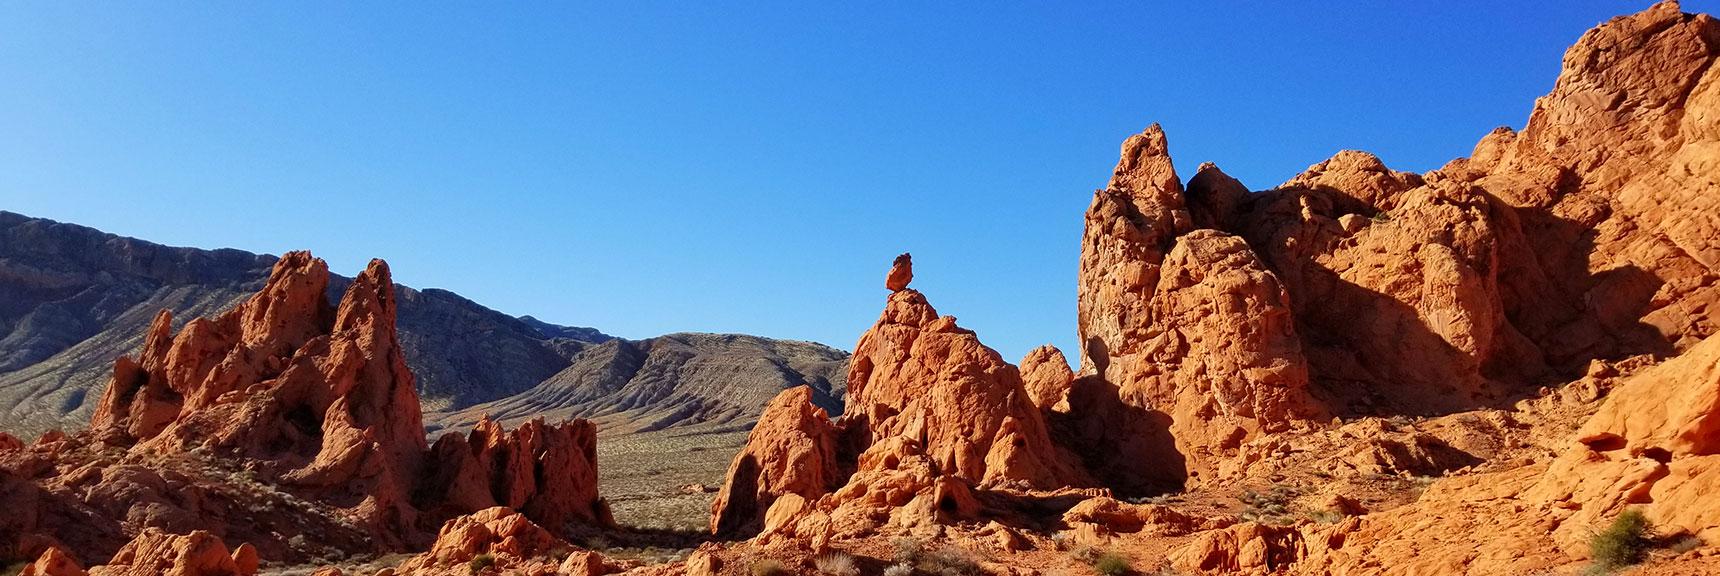 Looking Back on the Pinnales of Pinnacles Loop Trail in Valley of Fire State Park, Nevada